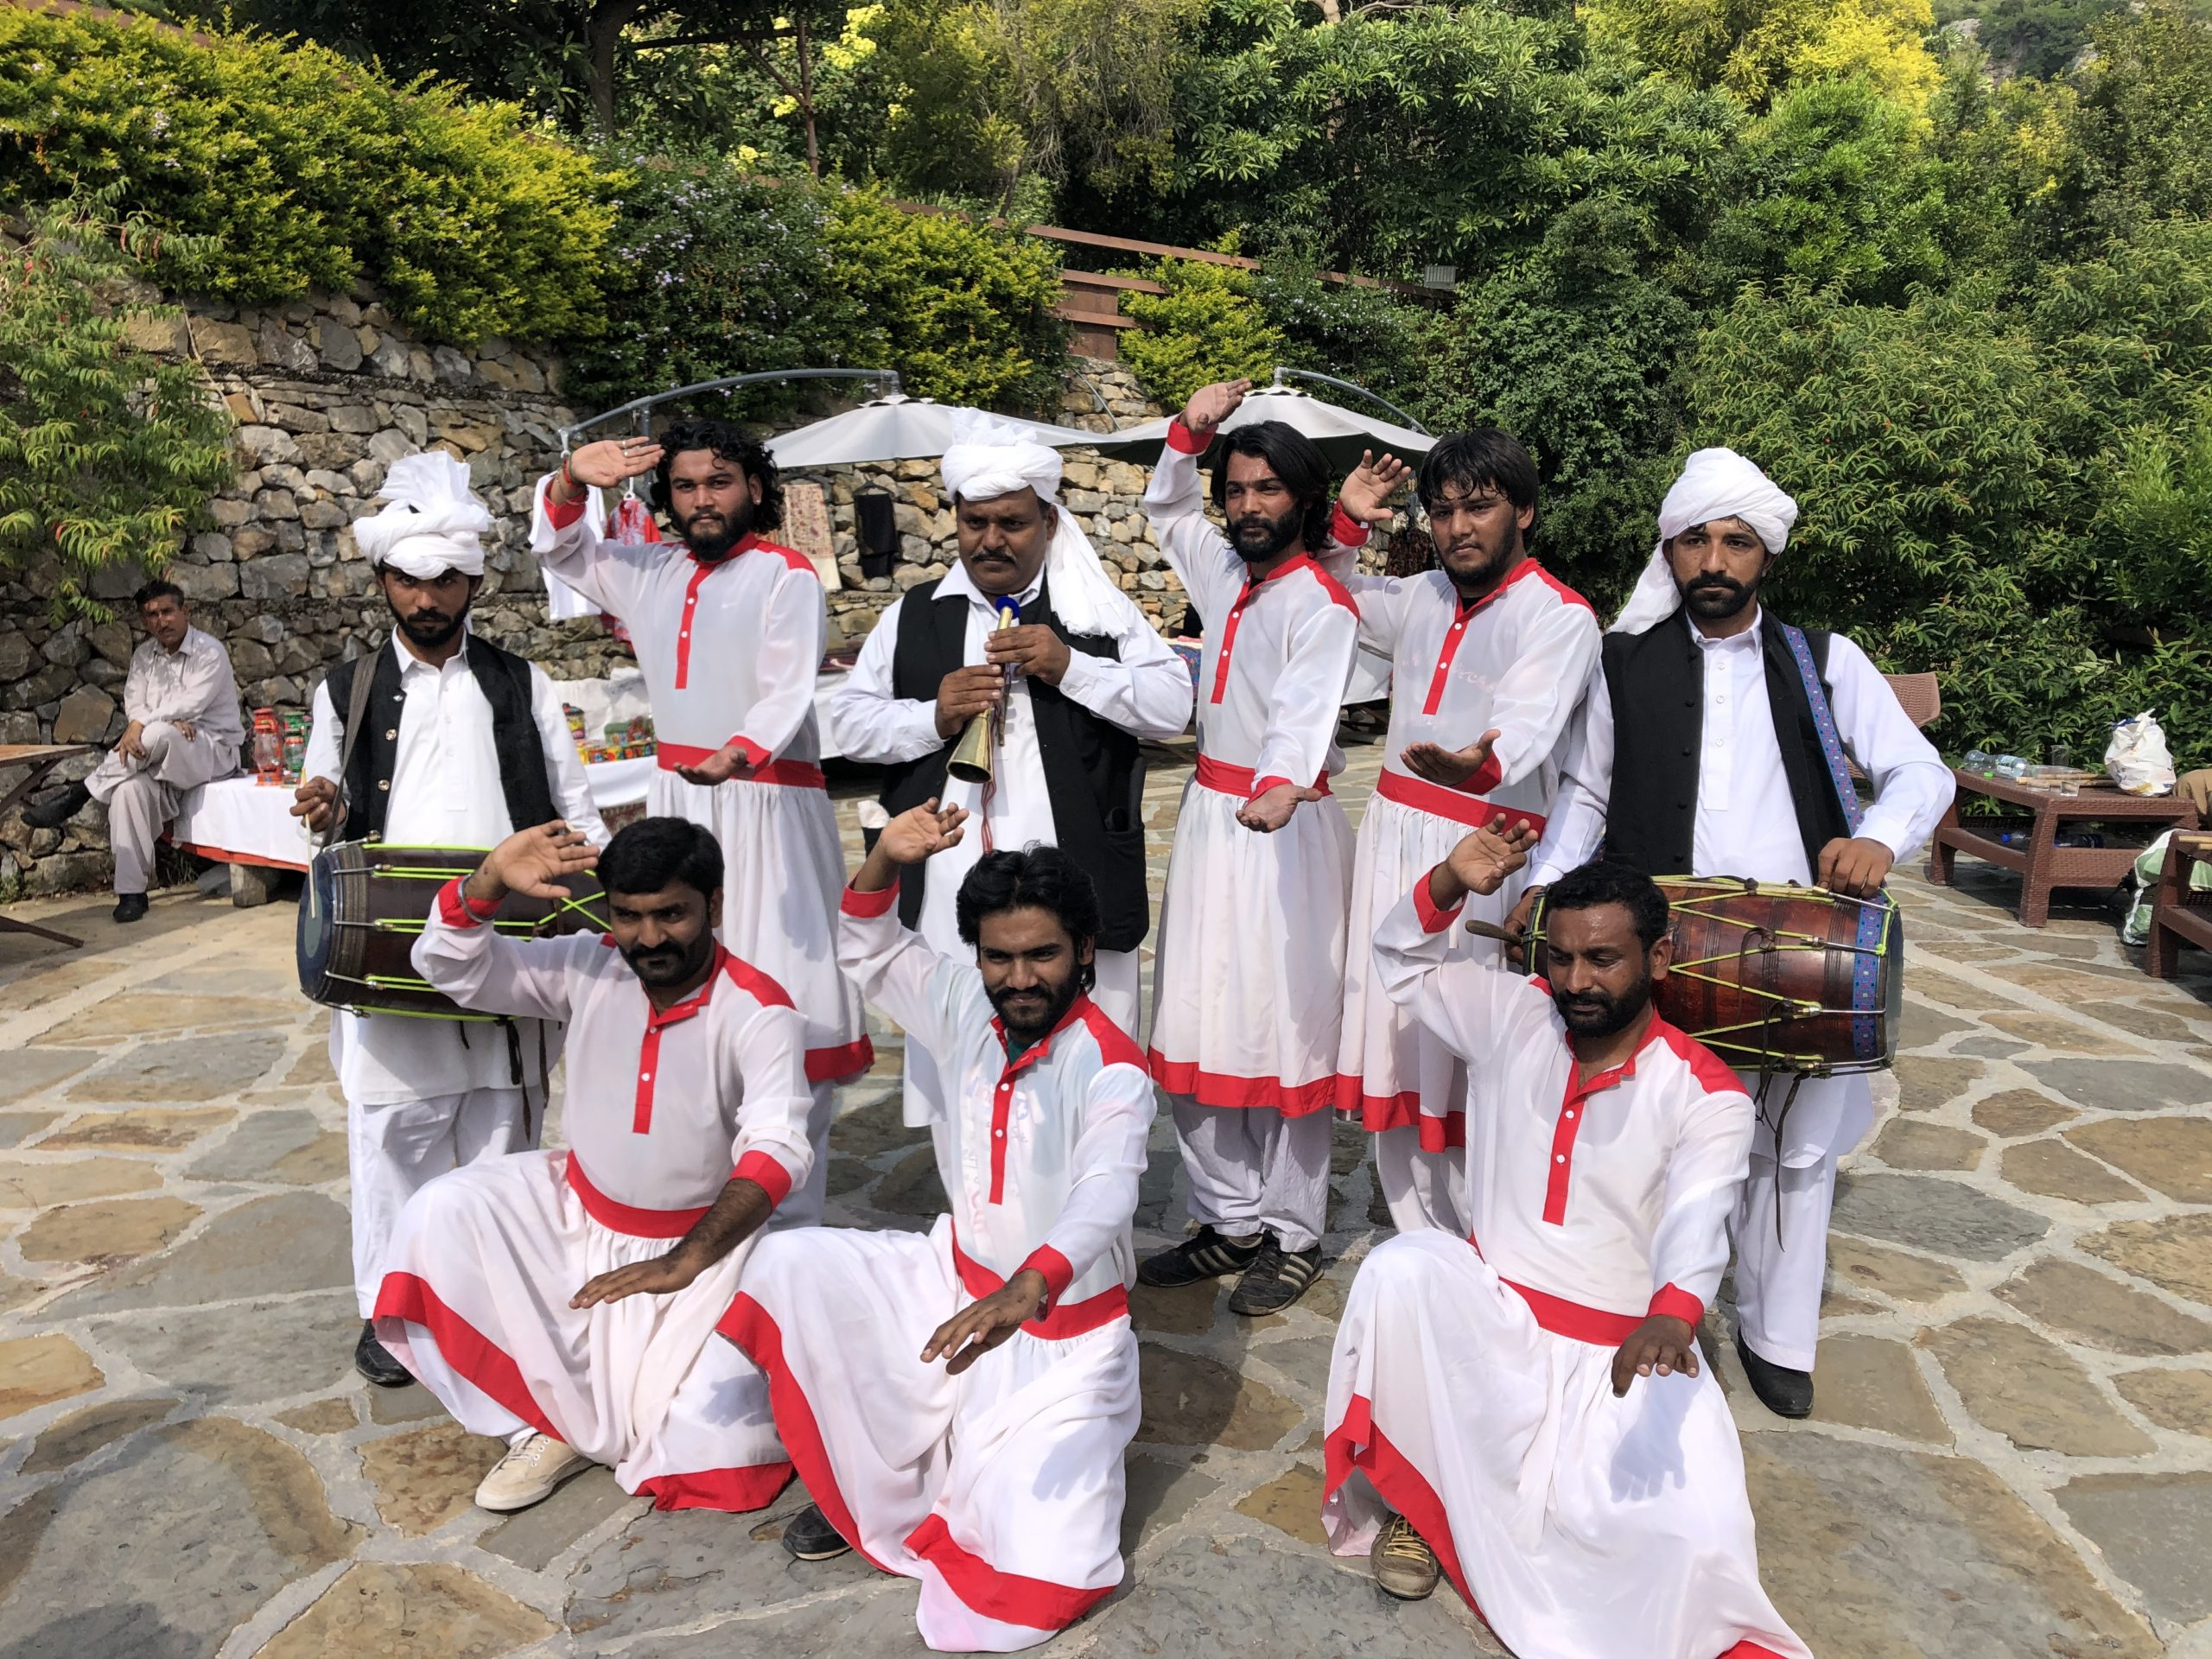 Folk dancers of Punjab Photo by Sonia Dhami